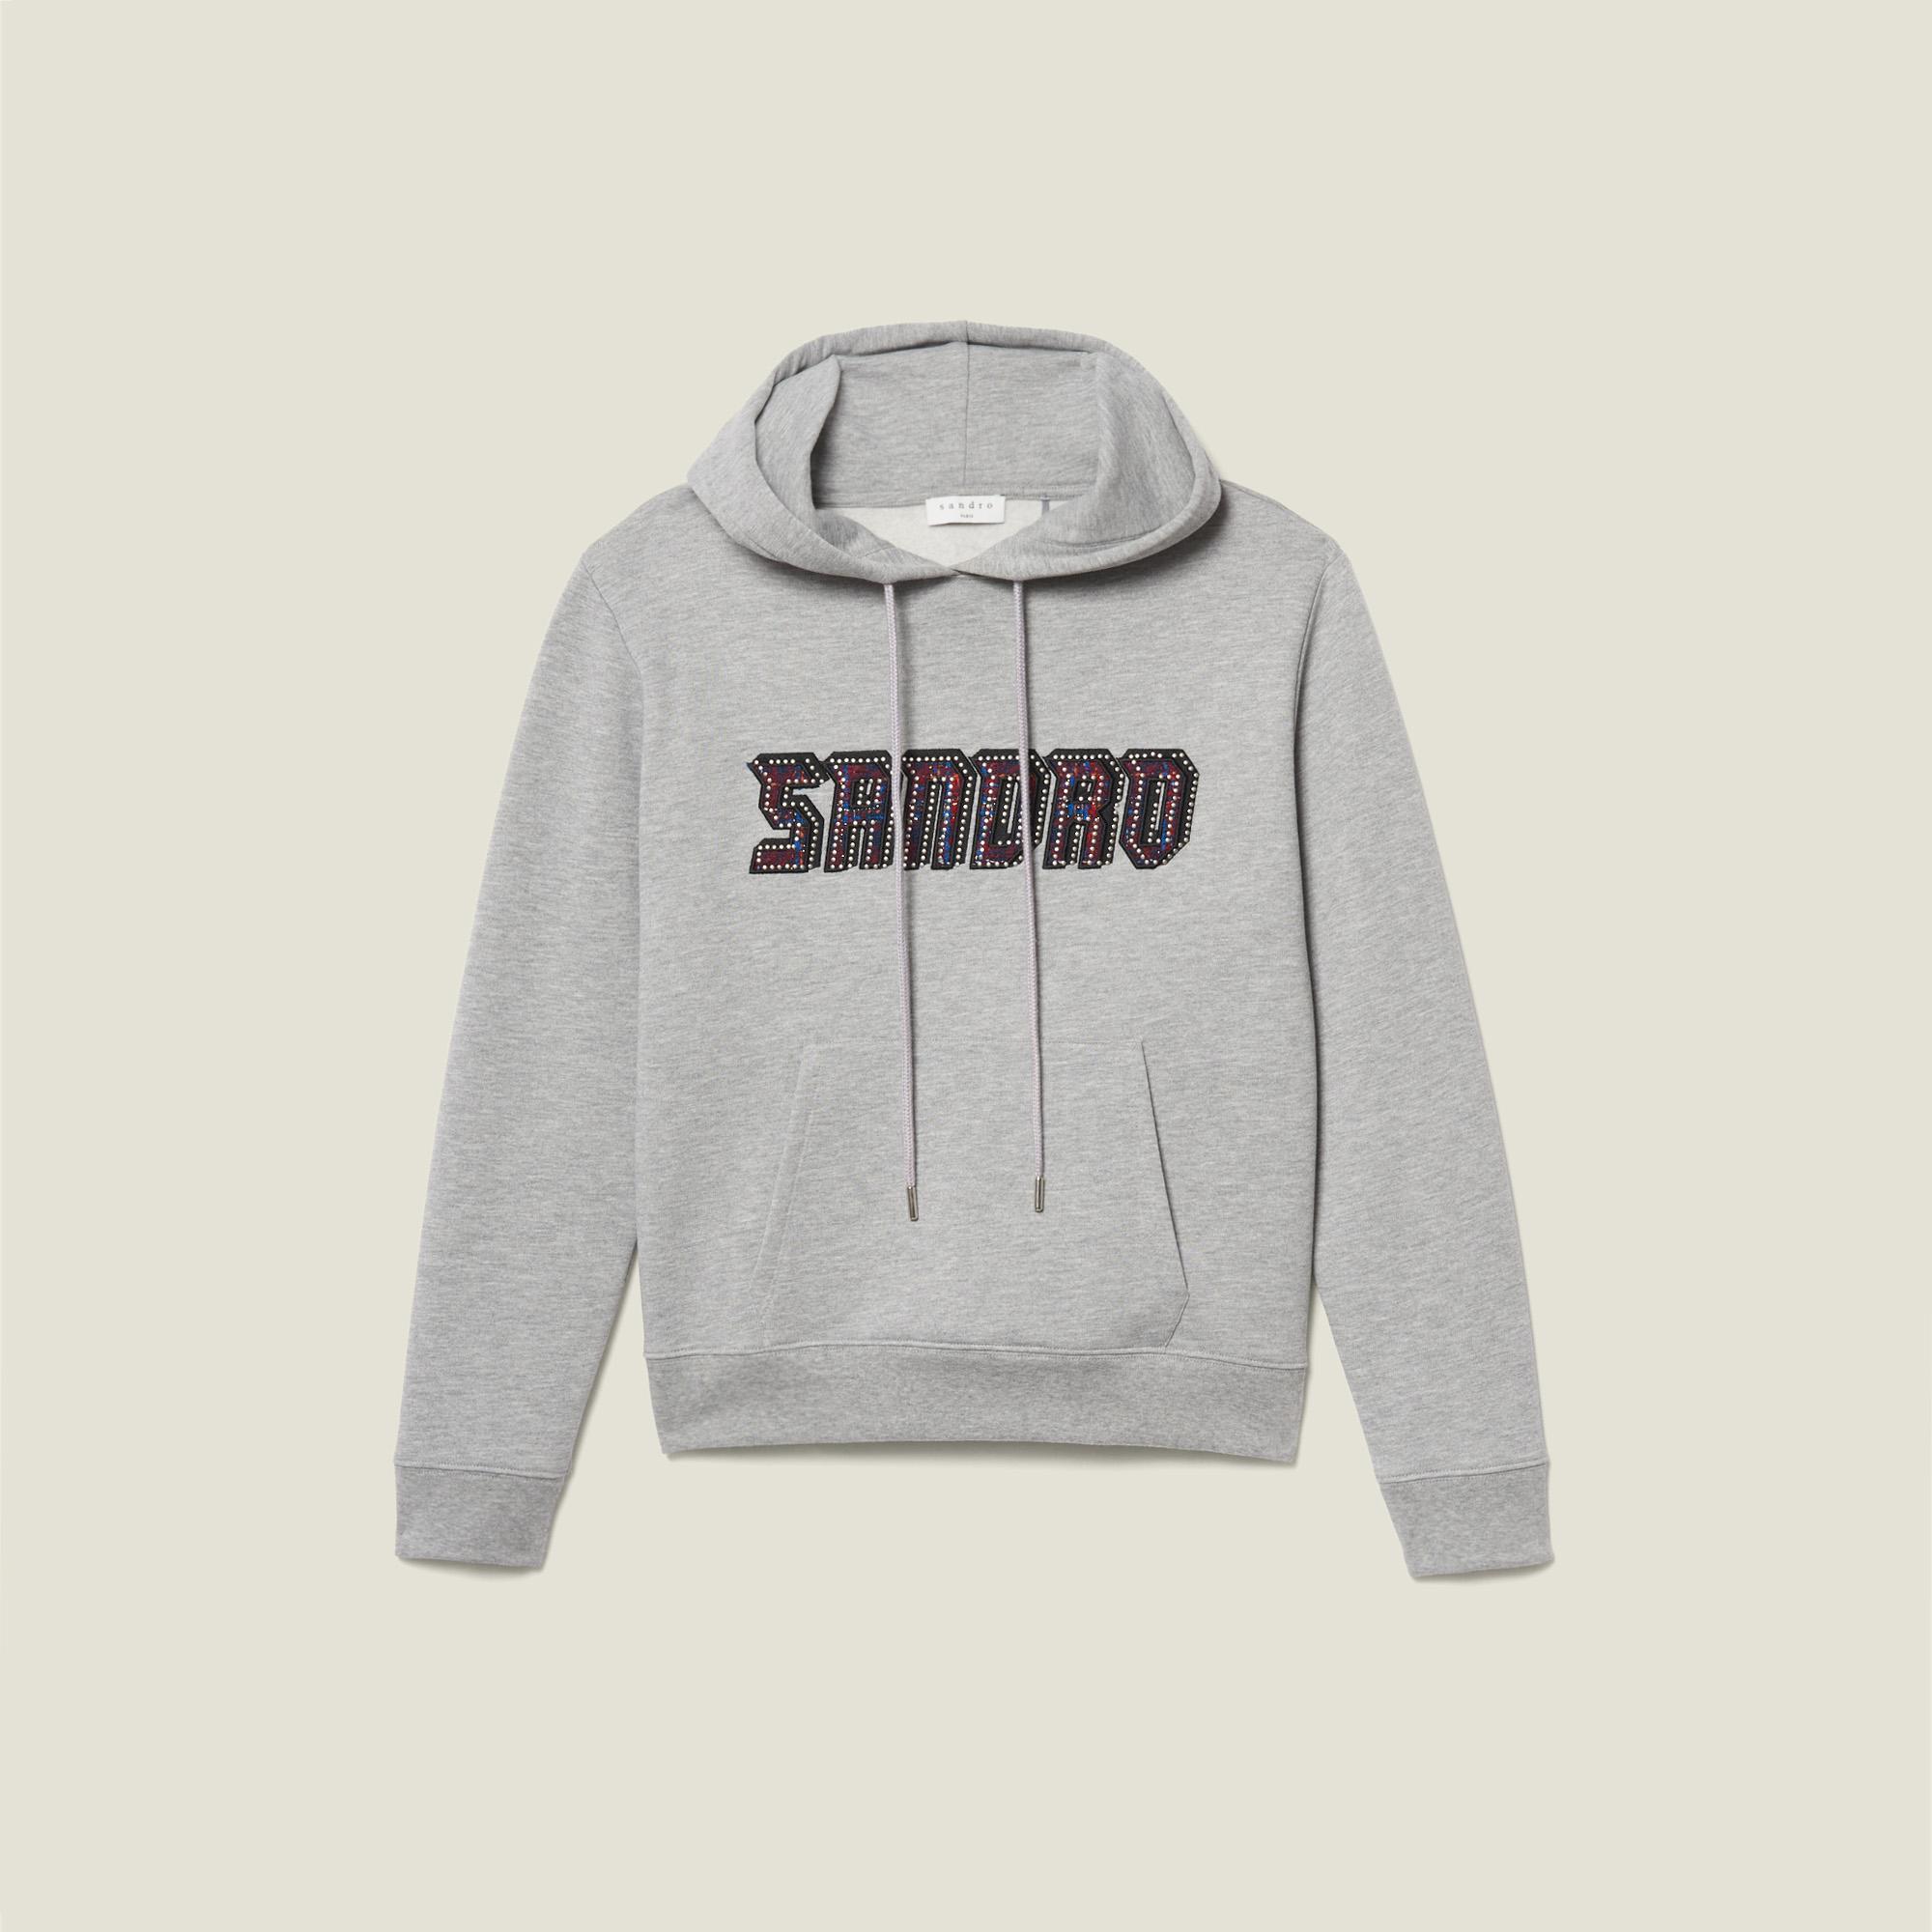 Sweatshirt With Sandro Lettering